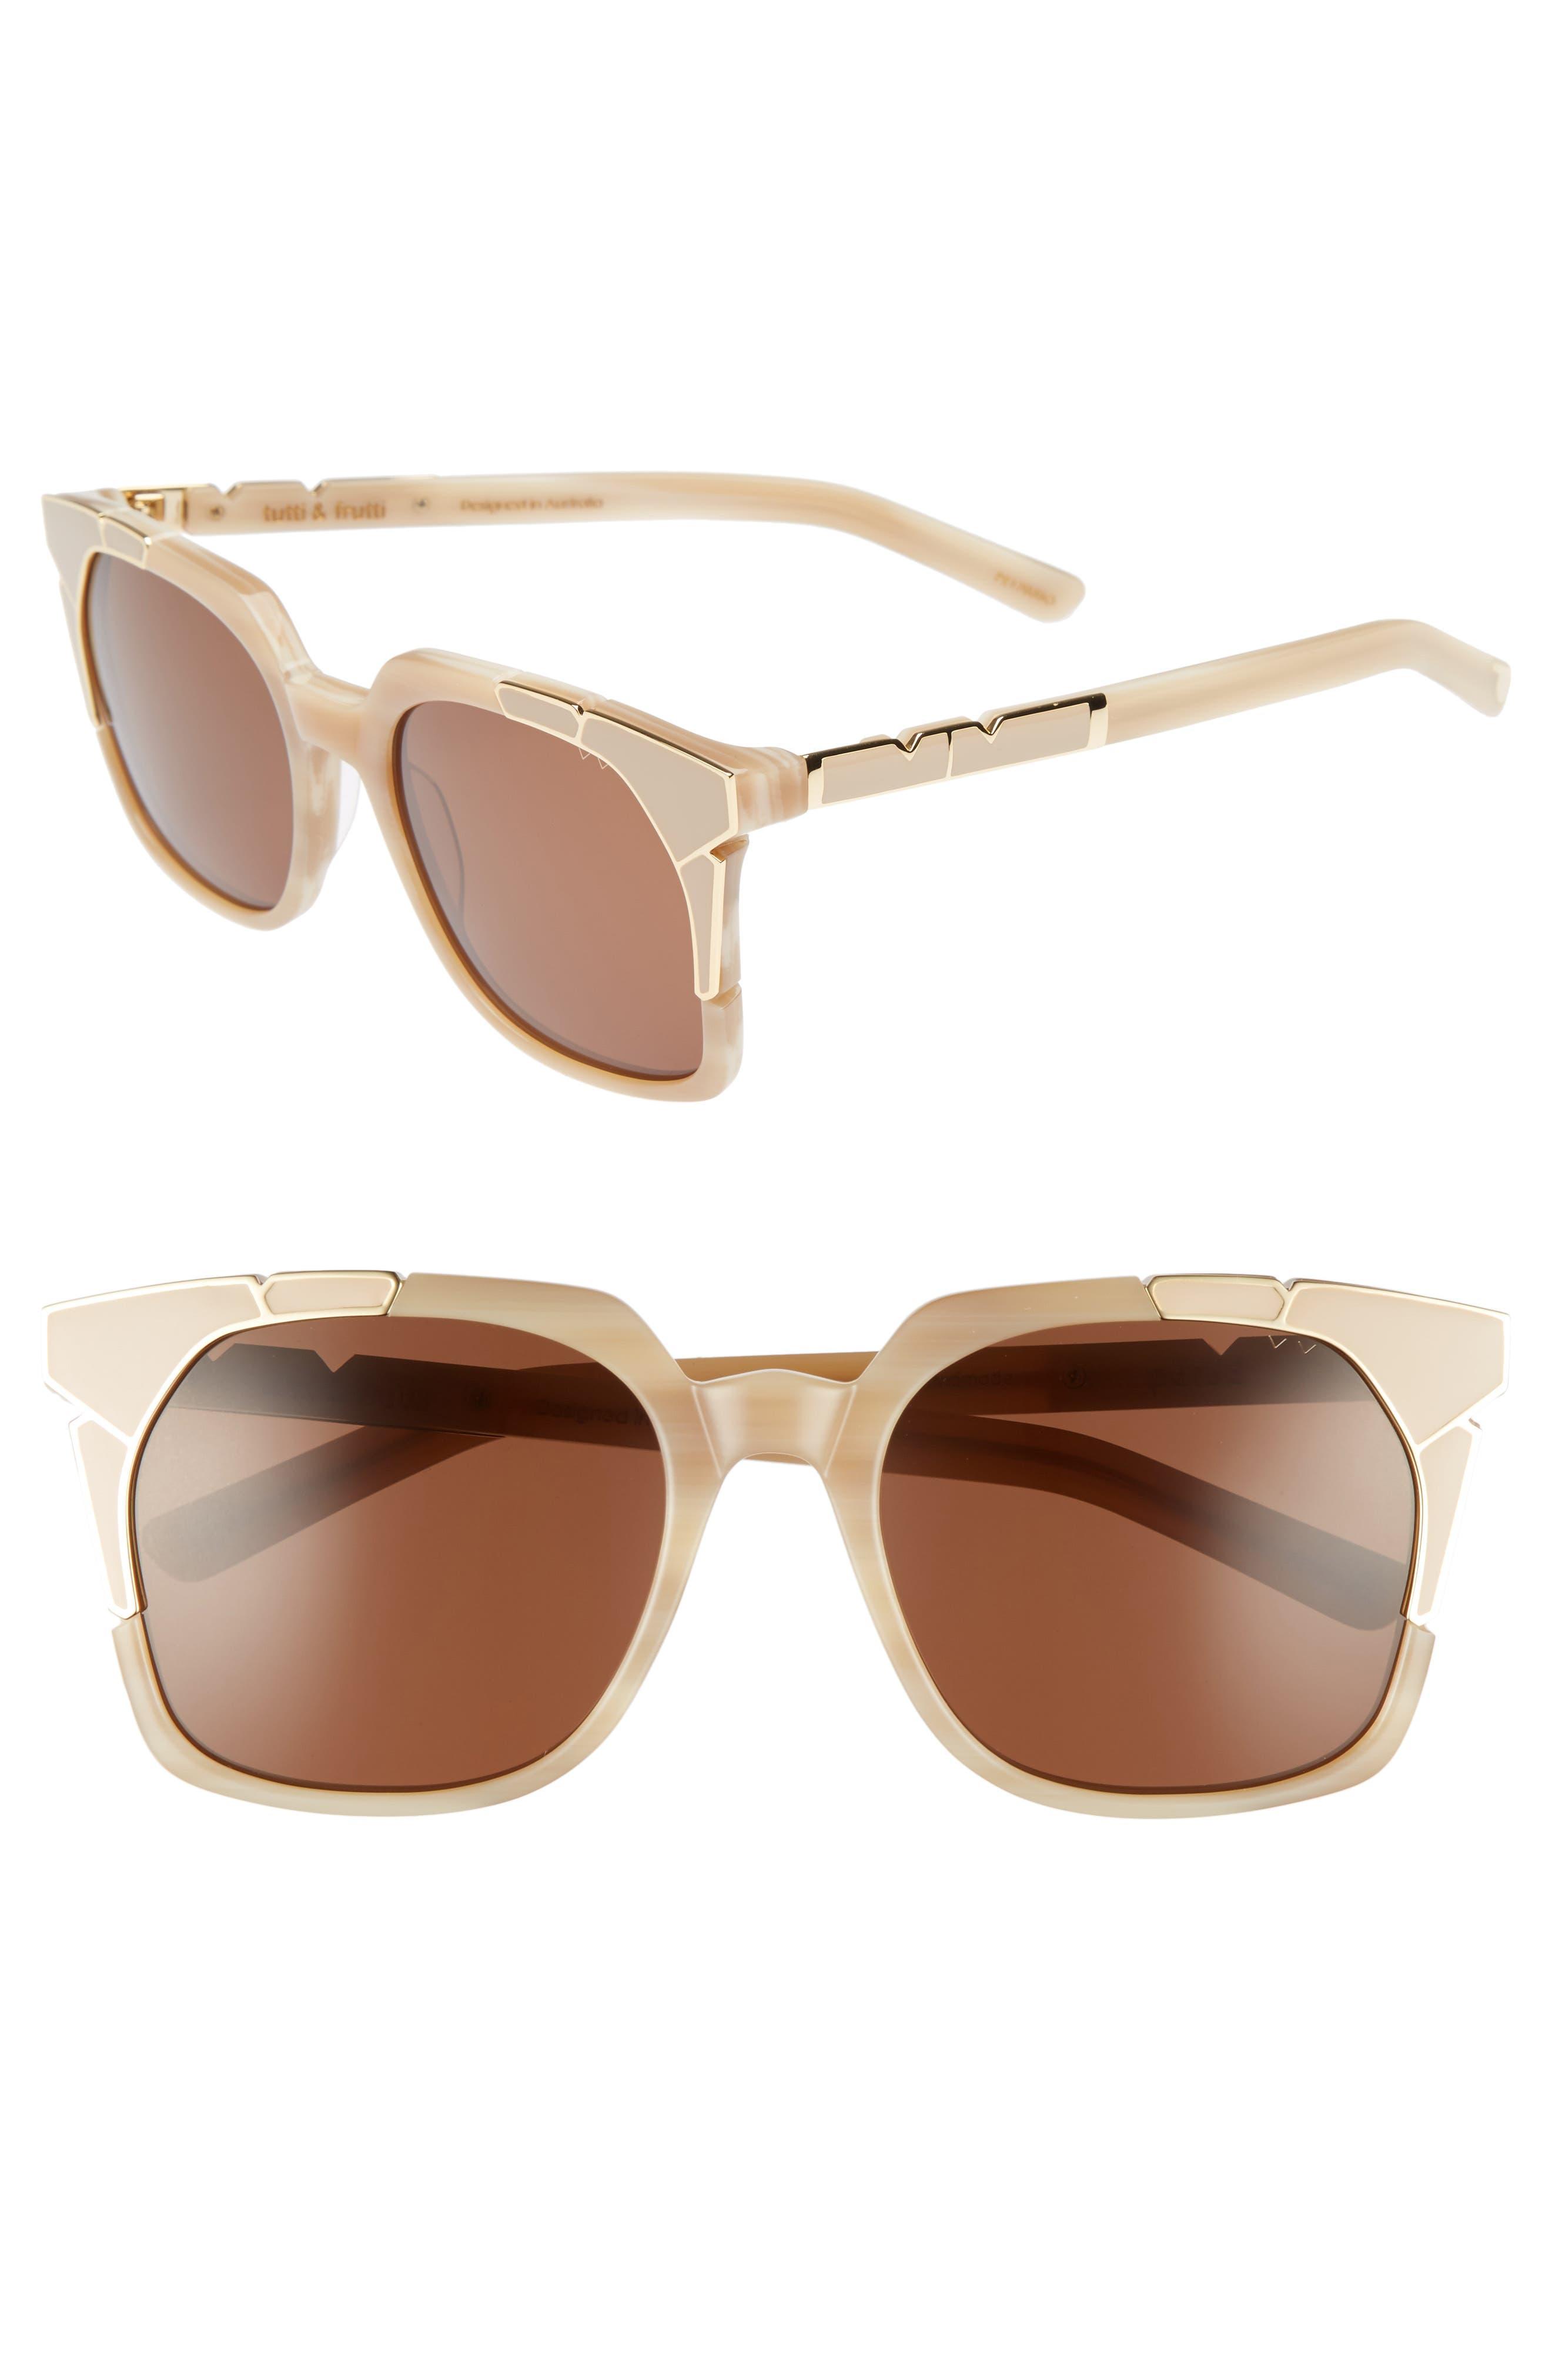 Alternate Image 1 Selected - Pared Tutti & Frutti 55mm Sunglasses